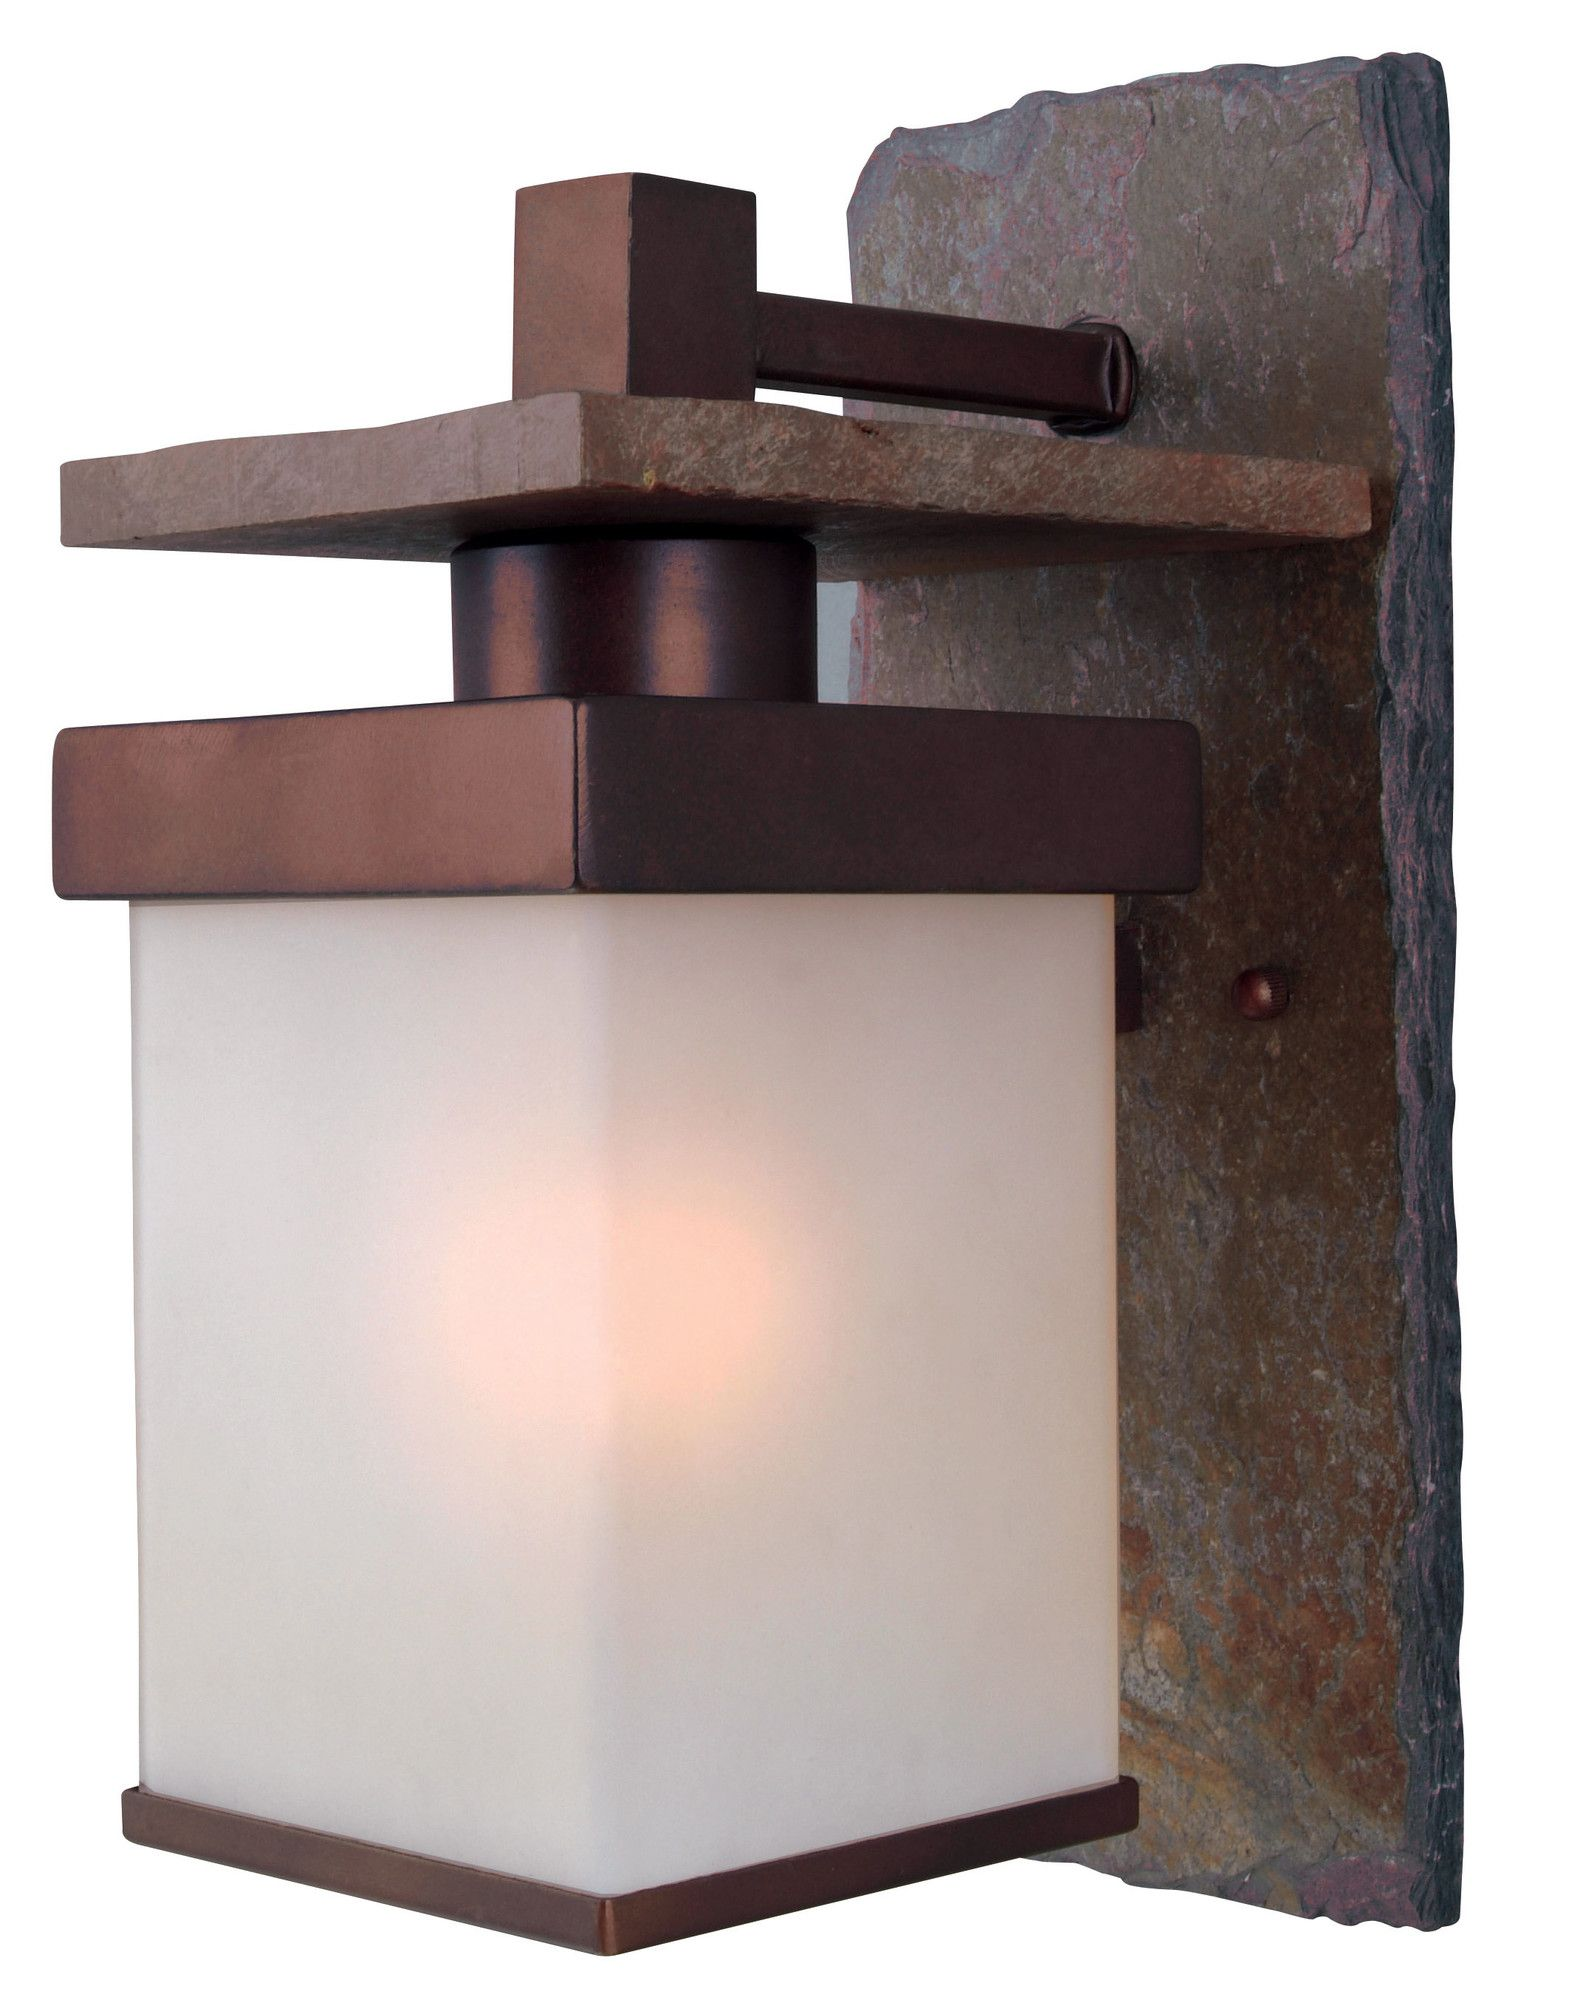 Boulder light outdoor sconce outdoor wall lantern outdoor walls